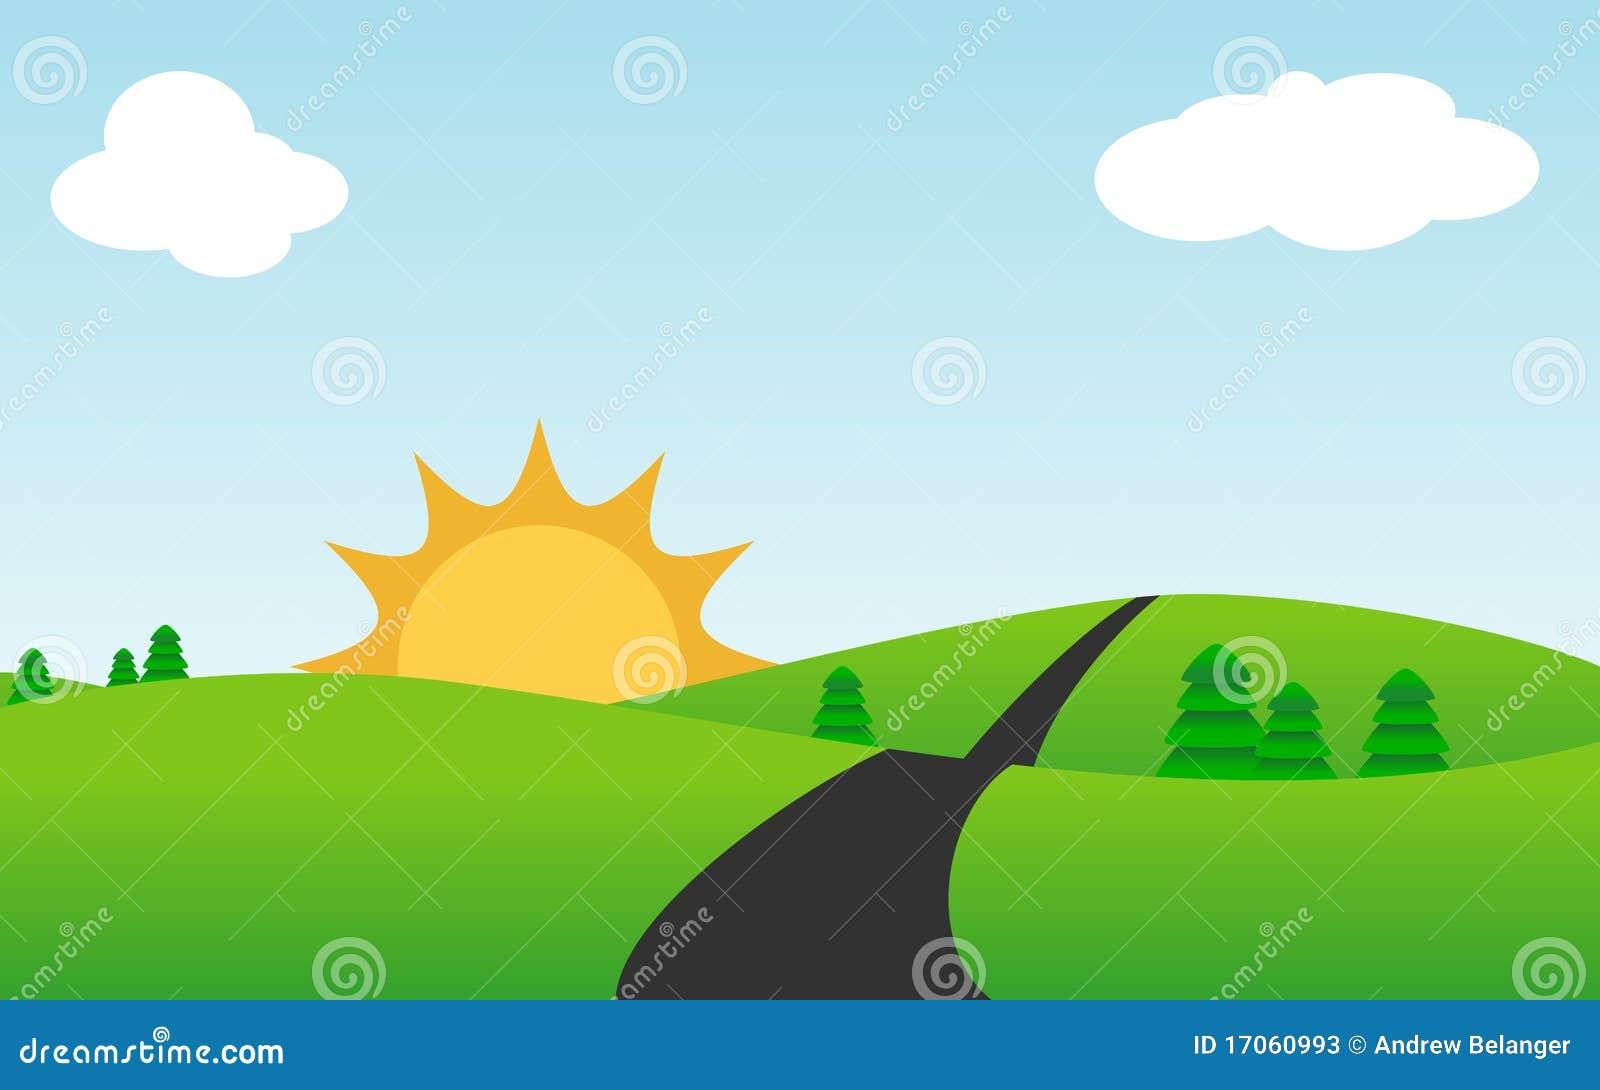 Cute Sunny Landscape Vector Stock Photos Image 17060993